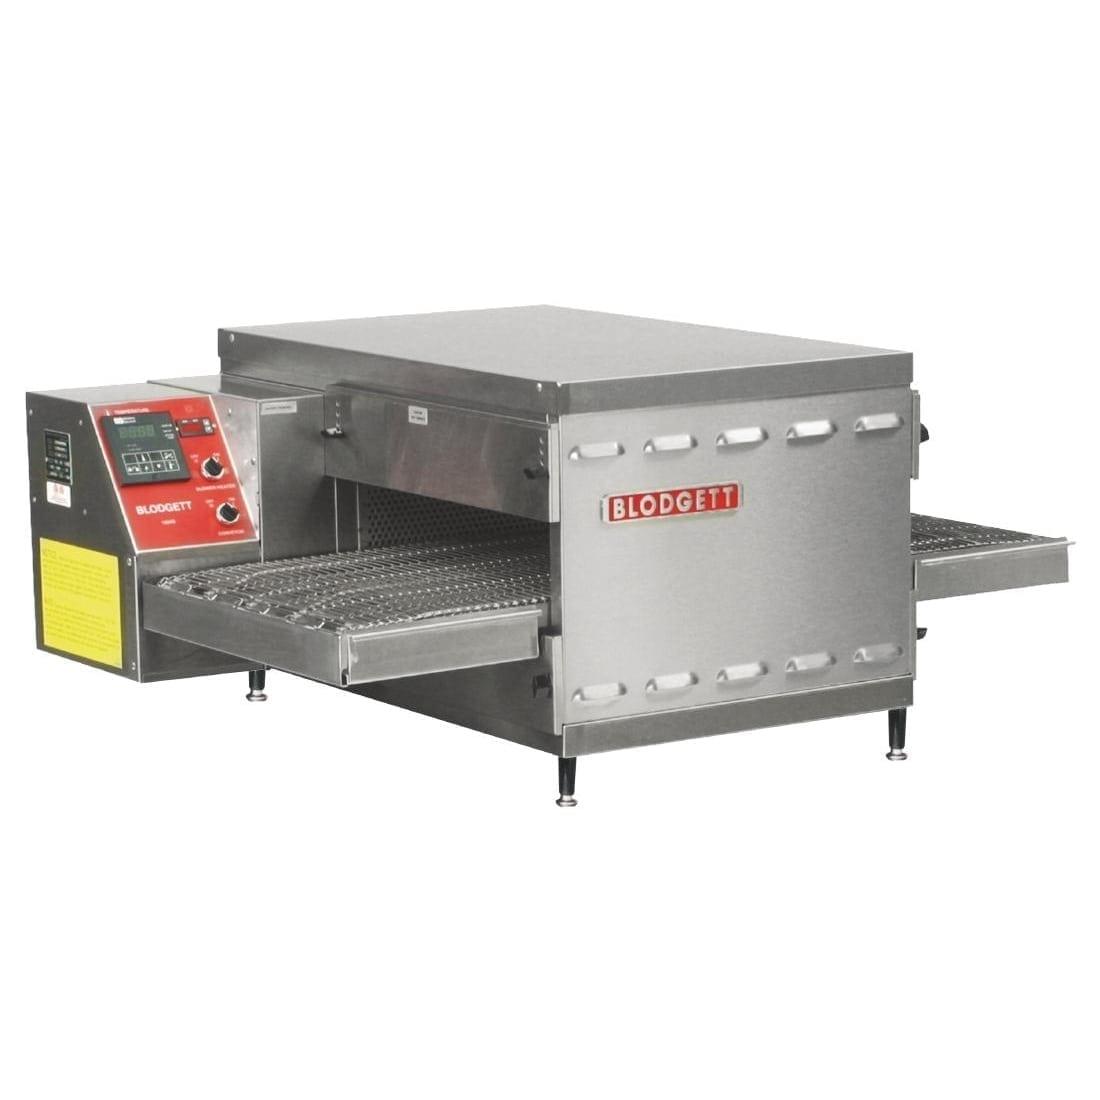 Blodgett Conveyor Oven - Electric (Direct)-0